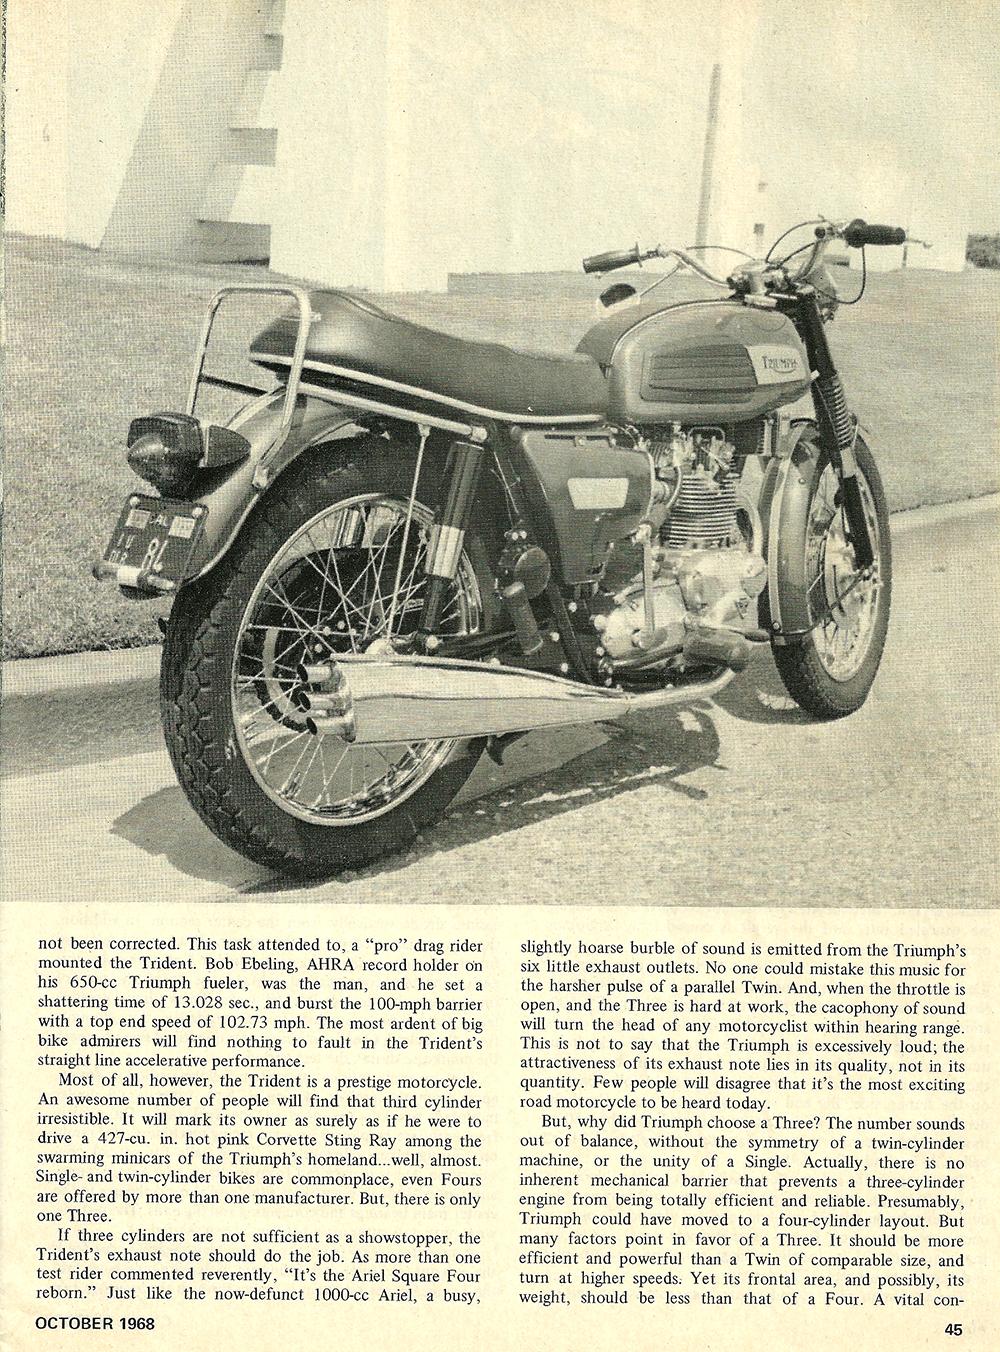 1968 Triumph Trident 750 road test 02.jpg